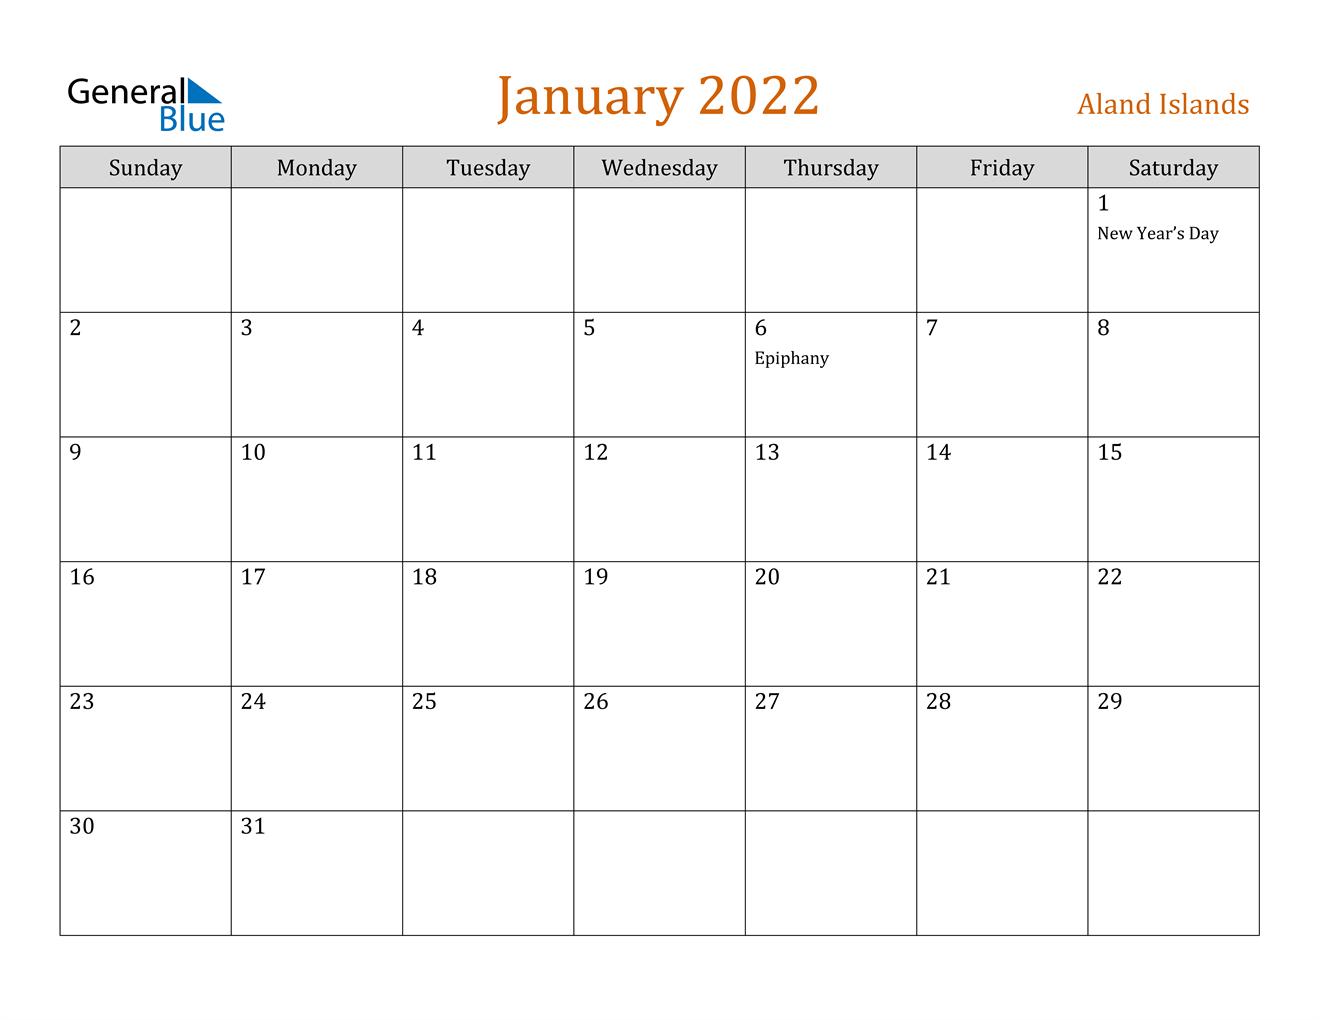 January 2022 Calendar - Aland Islands